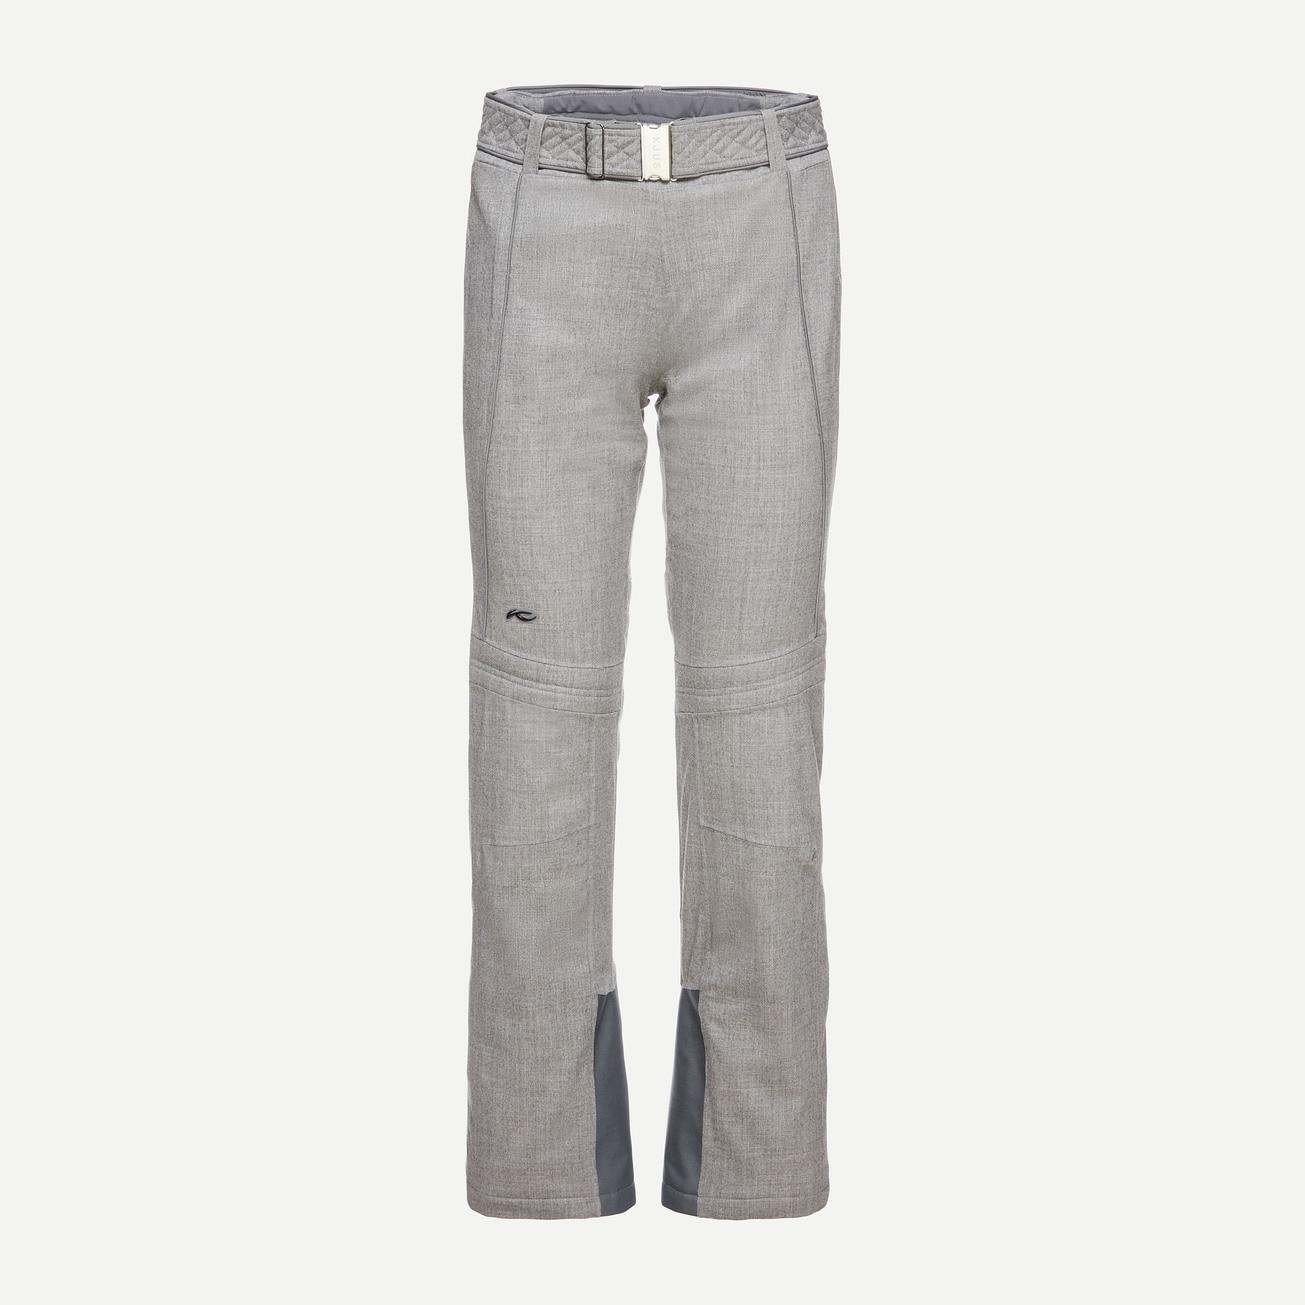 Pantalons De Ski Laine Mélangée Naira - Gris Kjus MN222gNnus